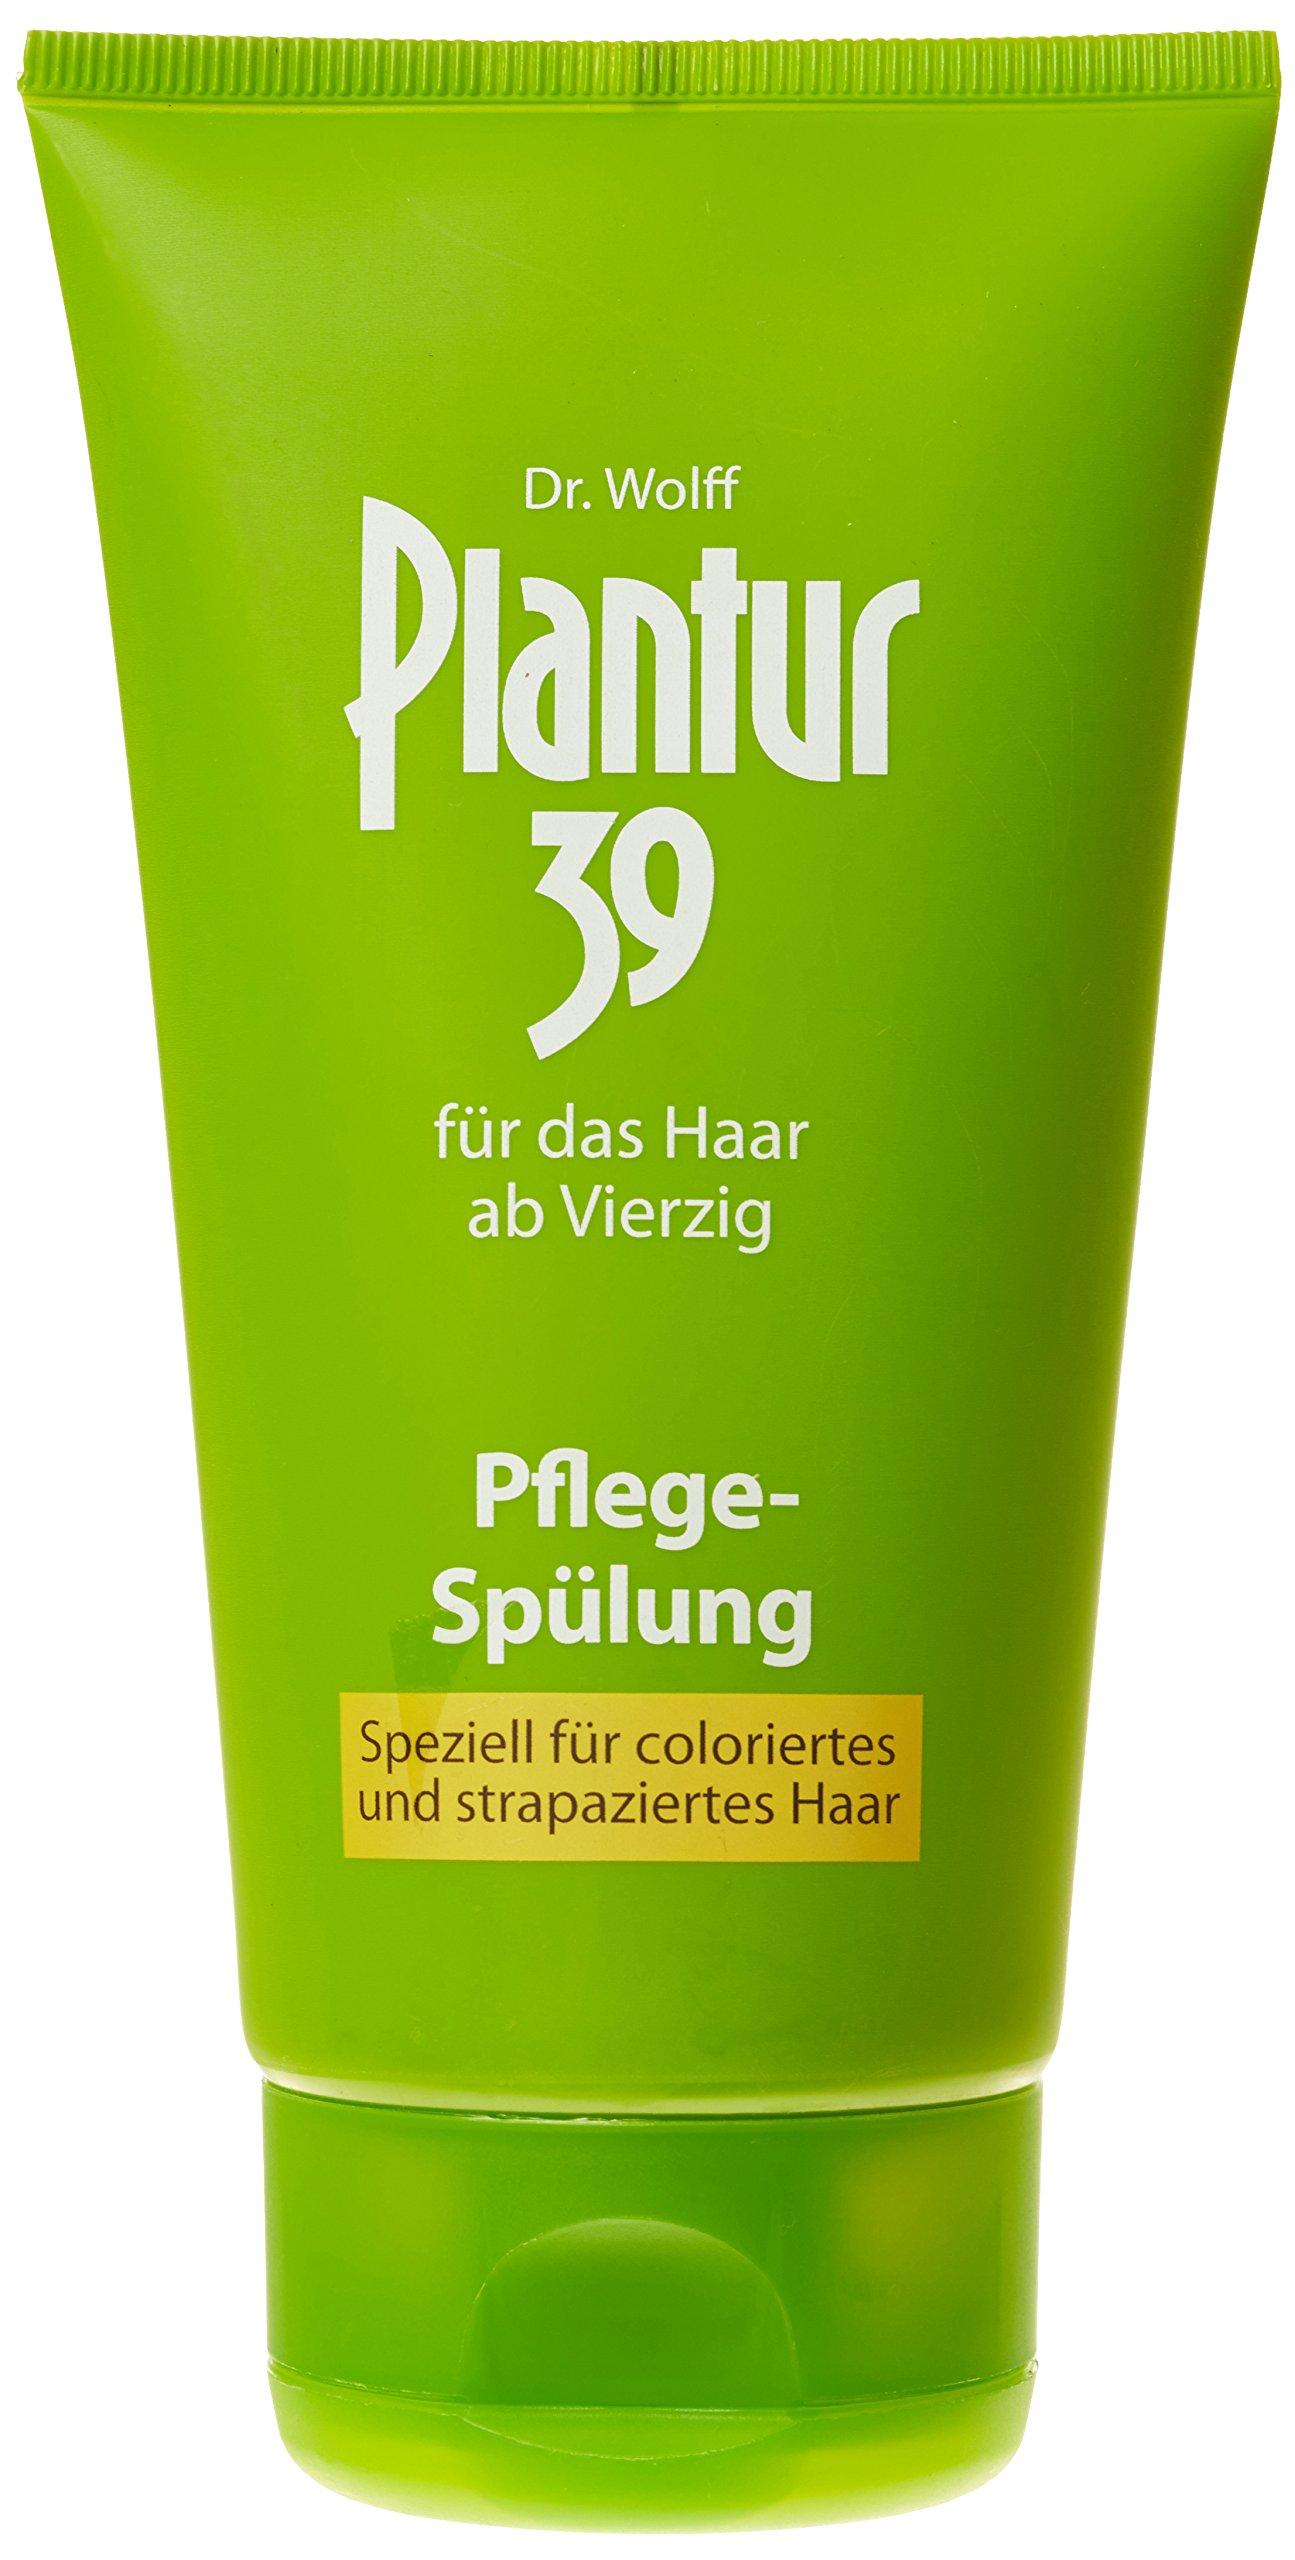 Plantur 39 Nourishing Conditioner for Coloured Stressed Hair 150 ml